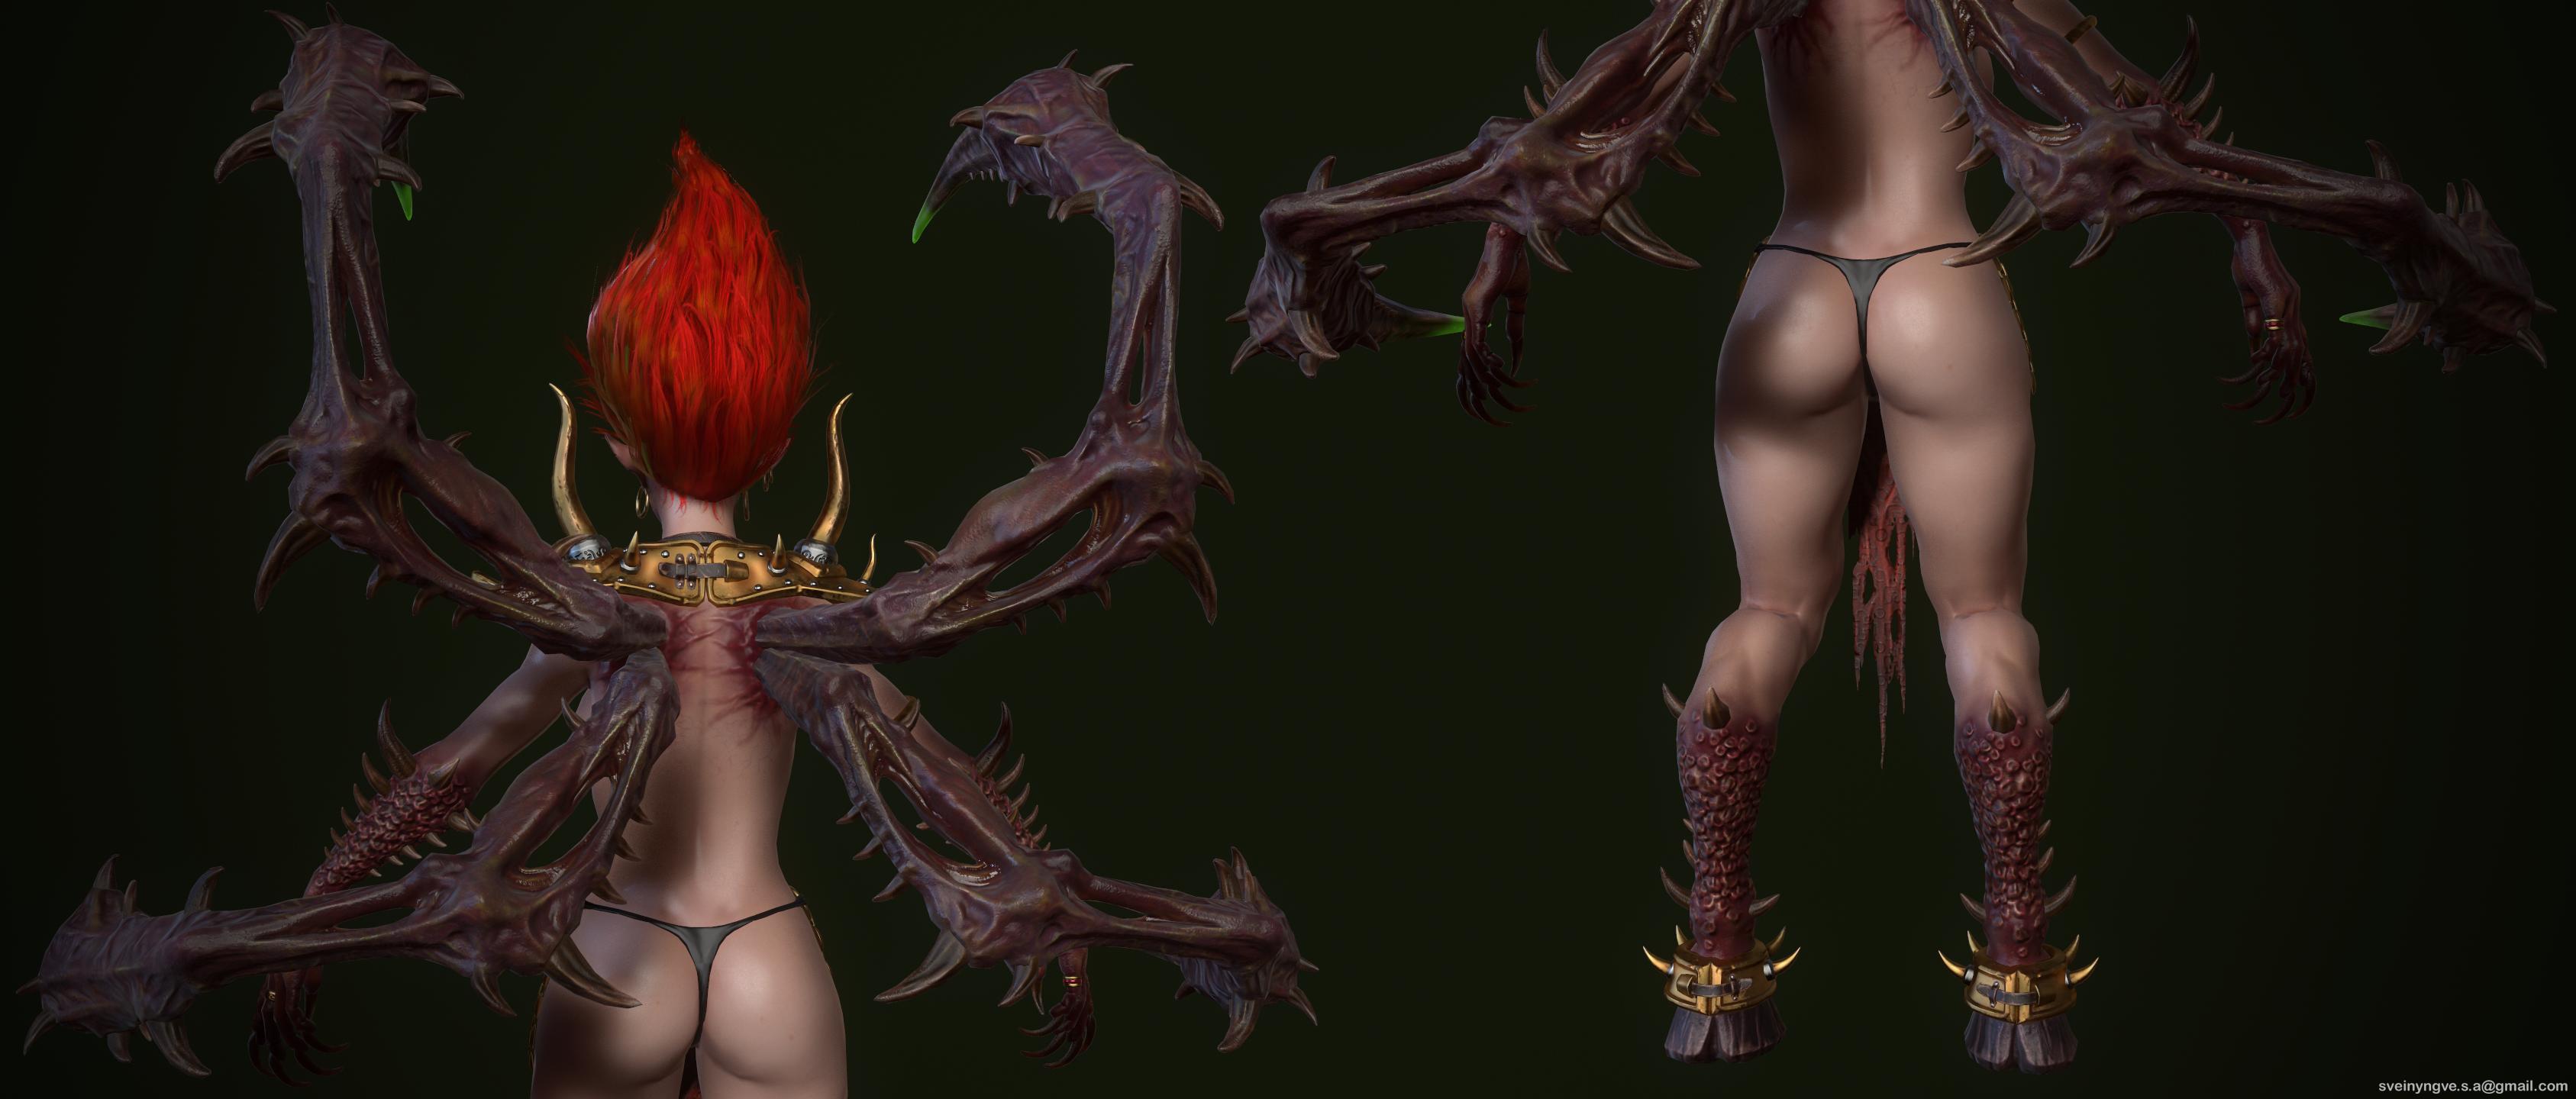 Sexe zombie porno naked gallery